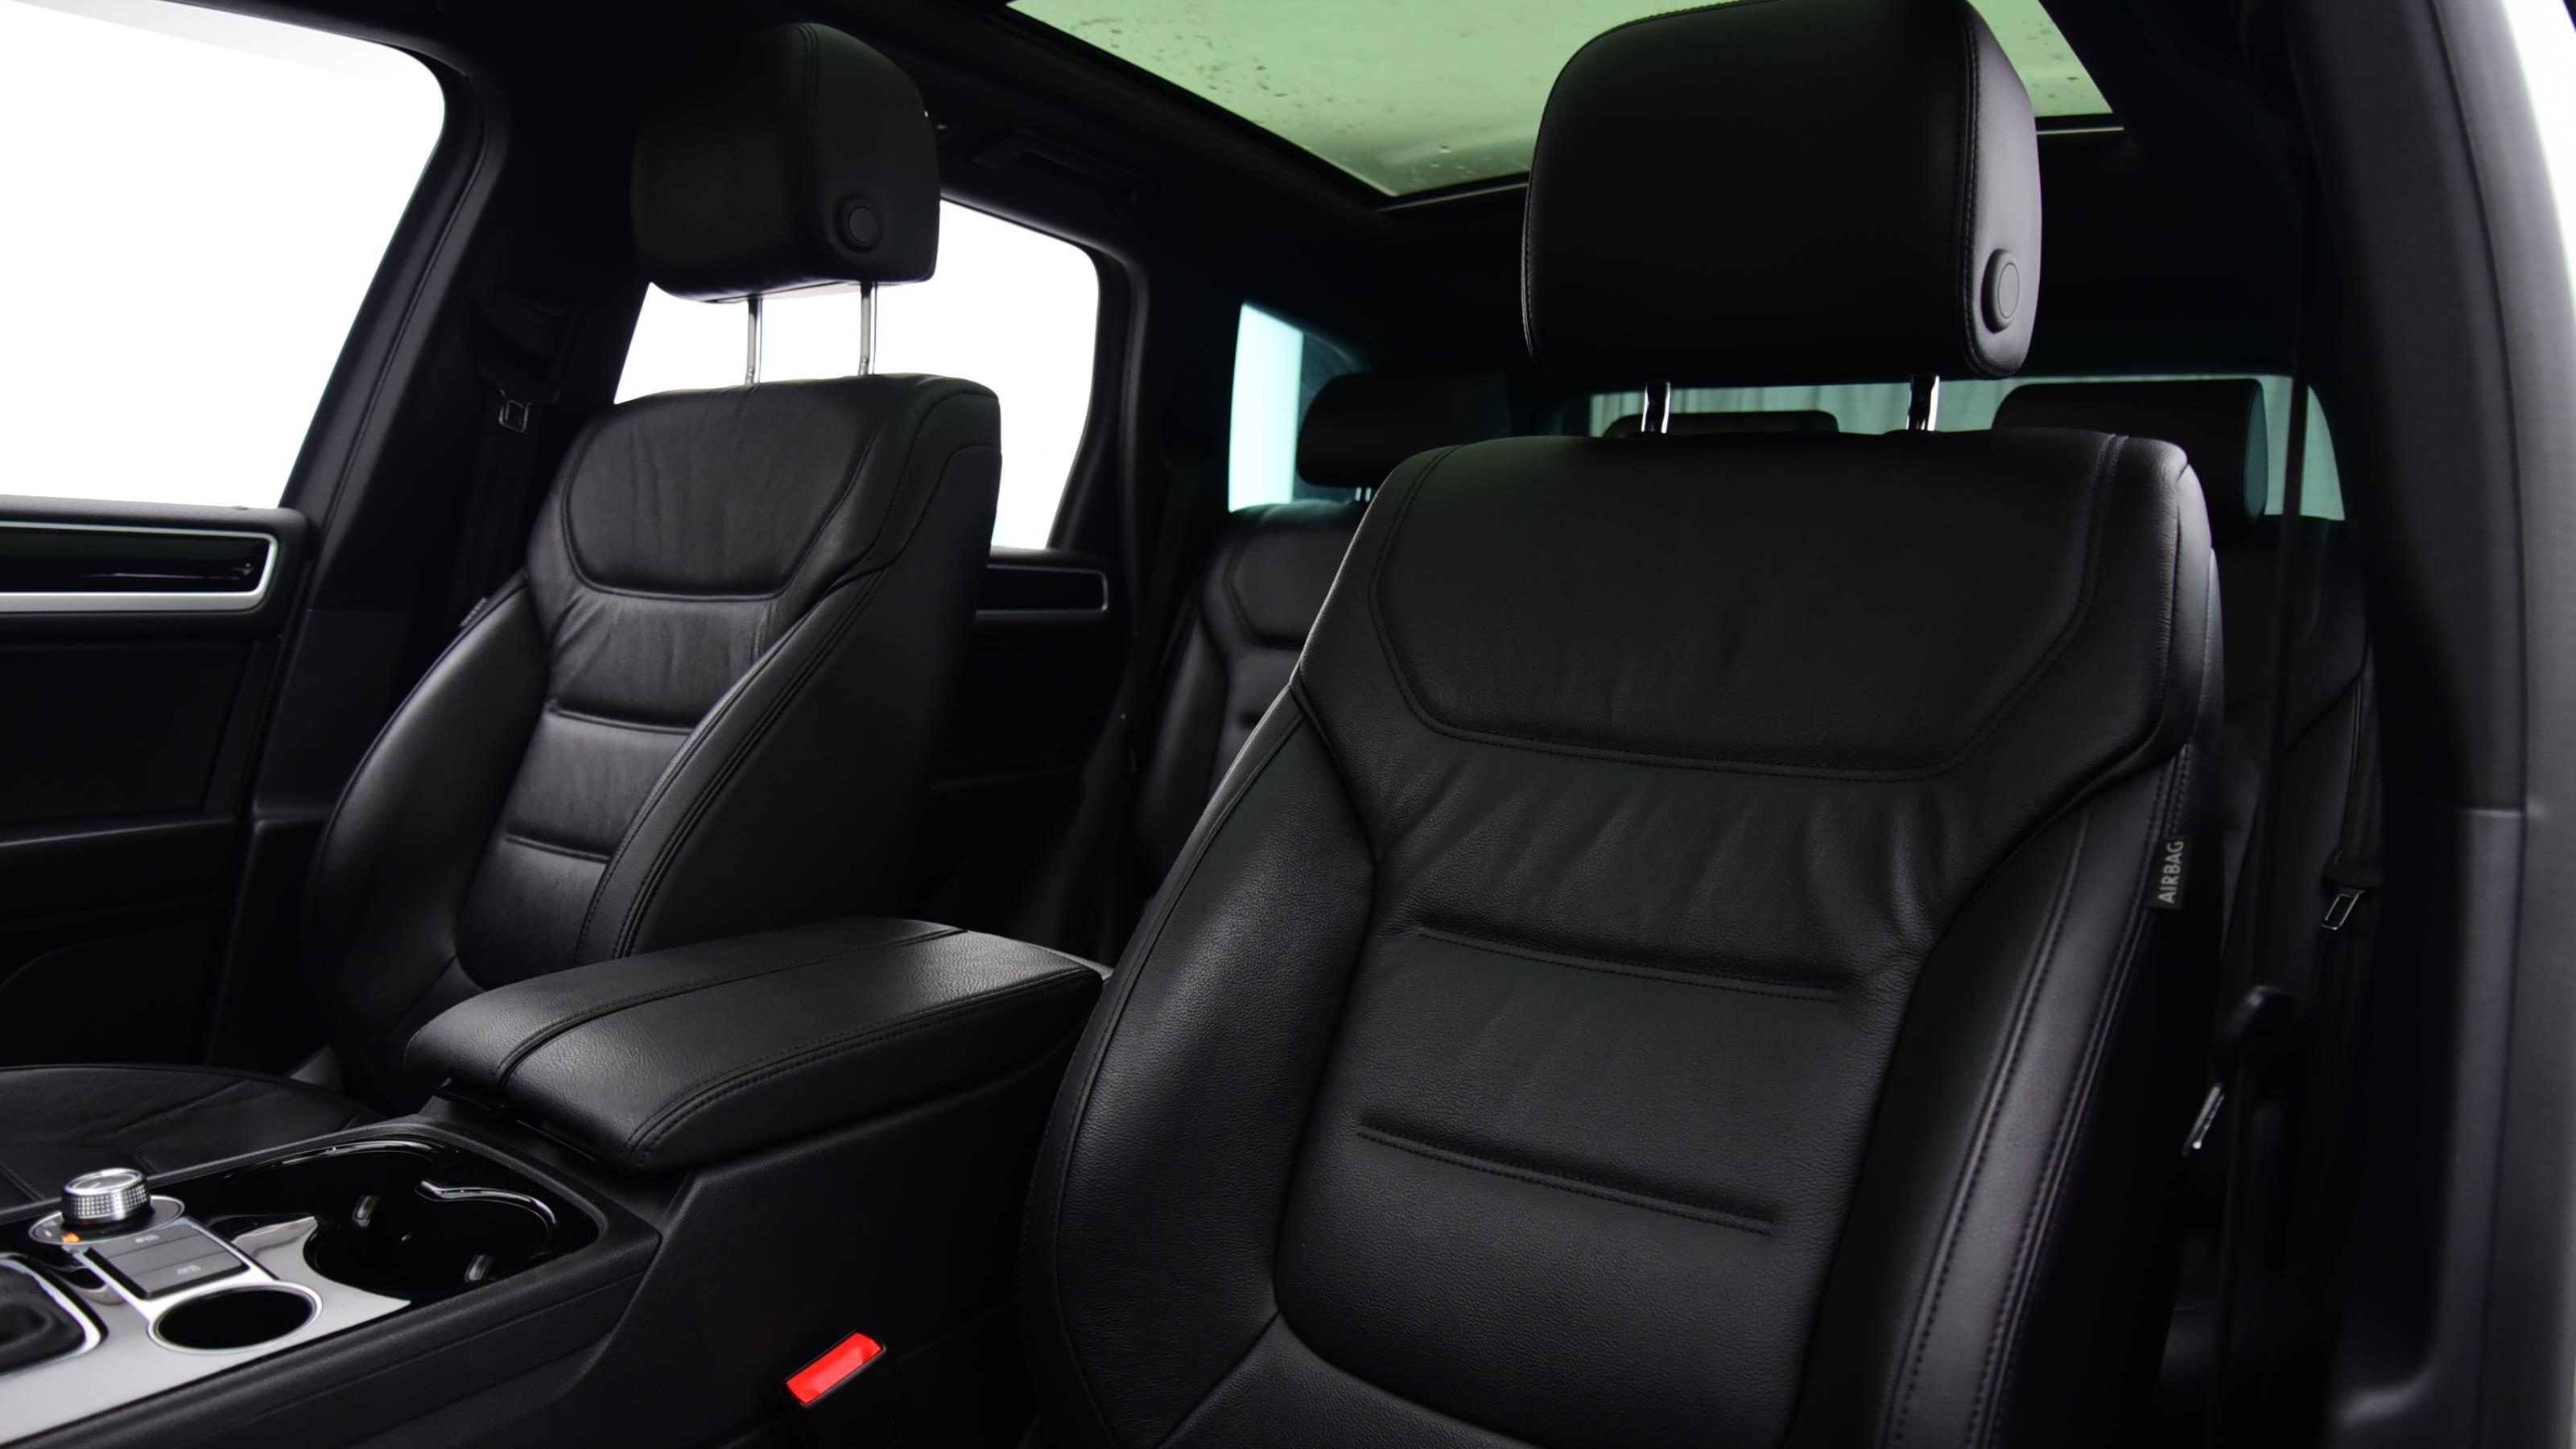 Used 2017 Volkswagen TOUAREG 3.0 V6 TDI BMT 262 R Line Plus 5dr Tip Auto WHITE at Saxton4x4